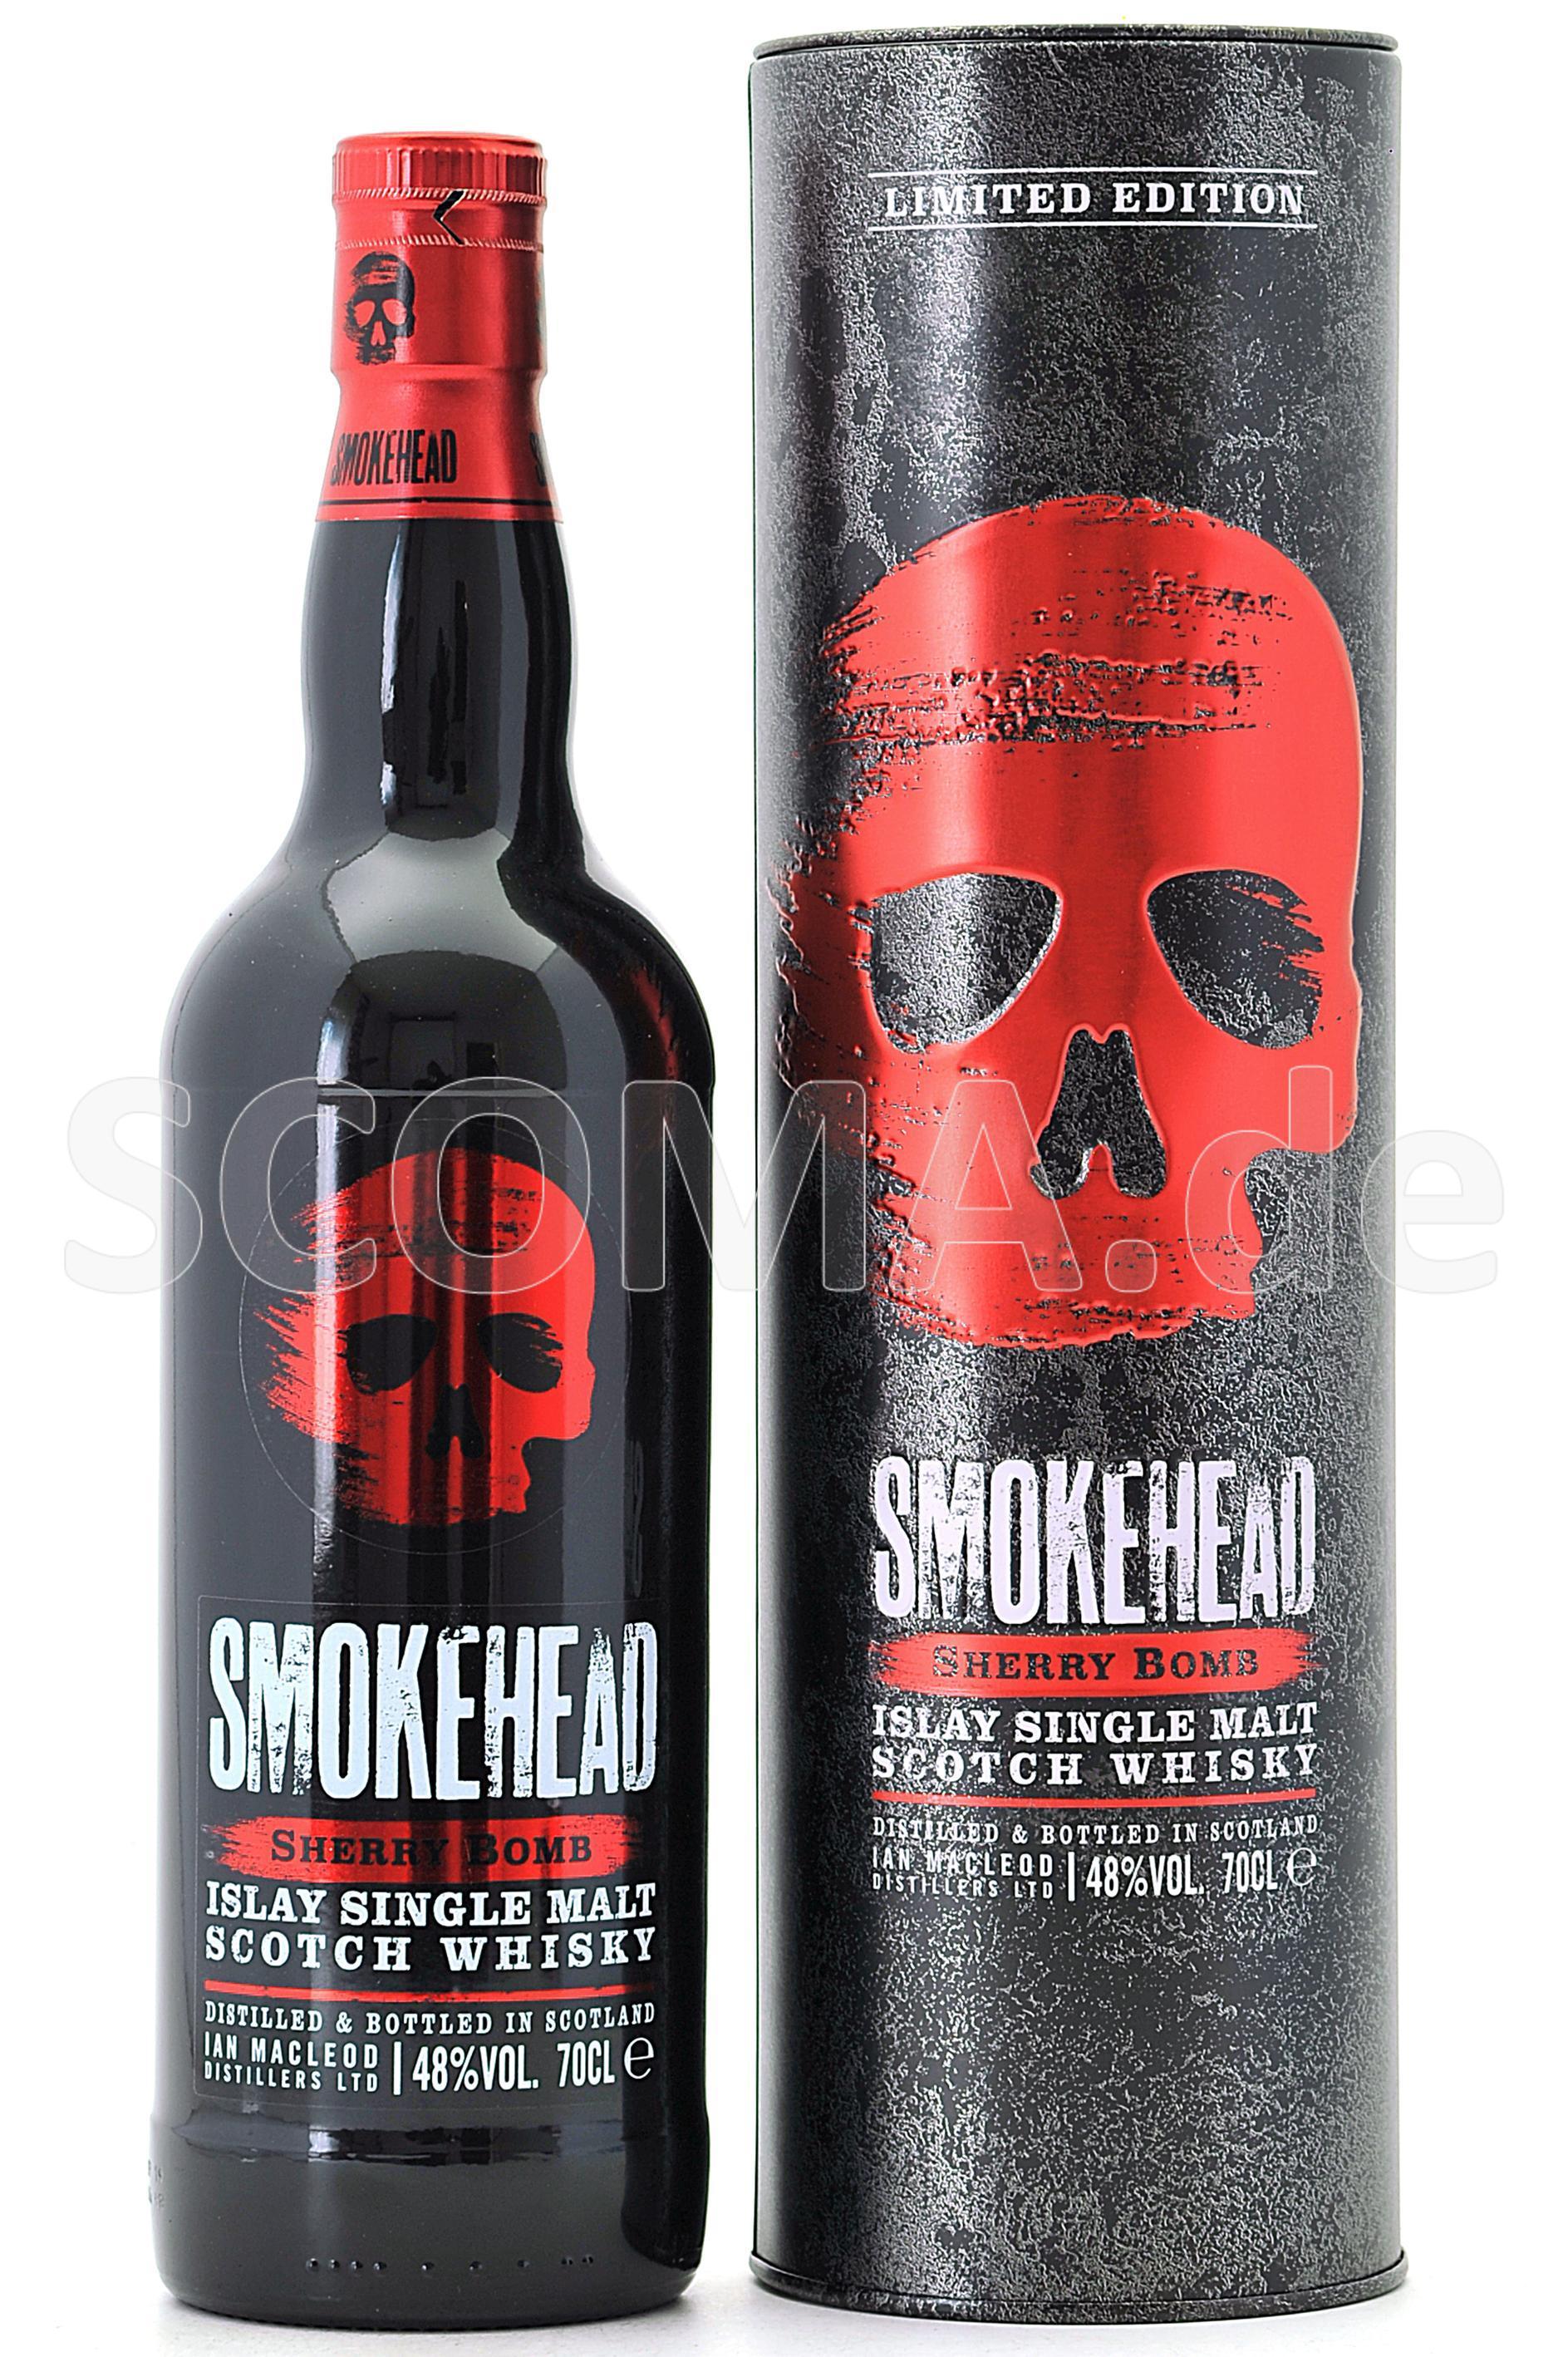 Smokehead Sherry Bomb Batch #2